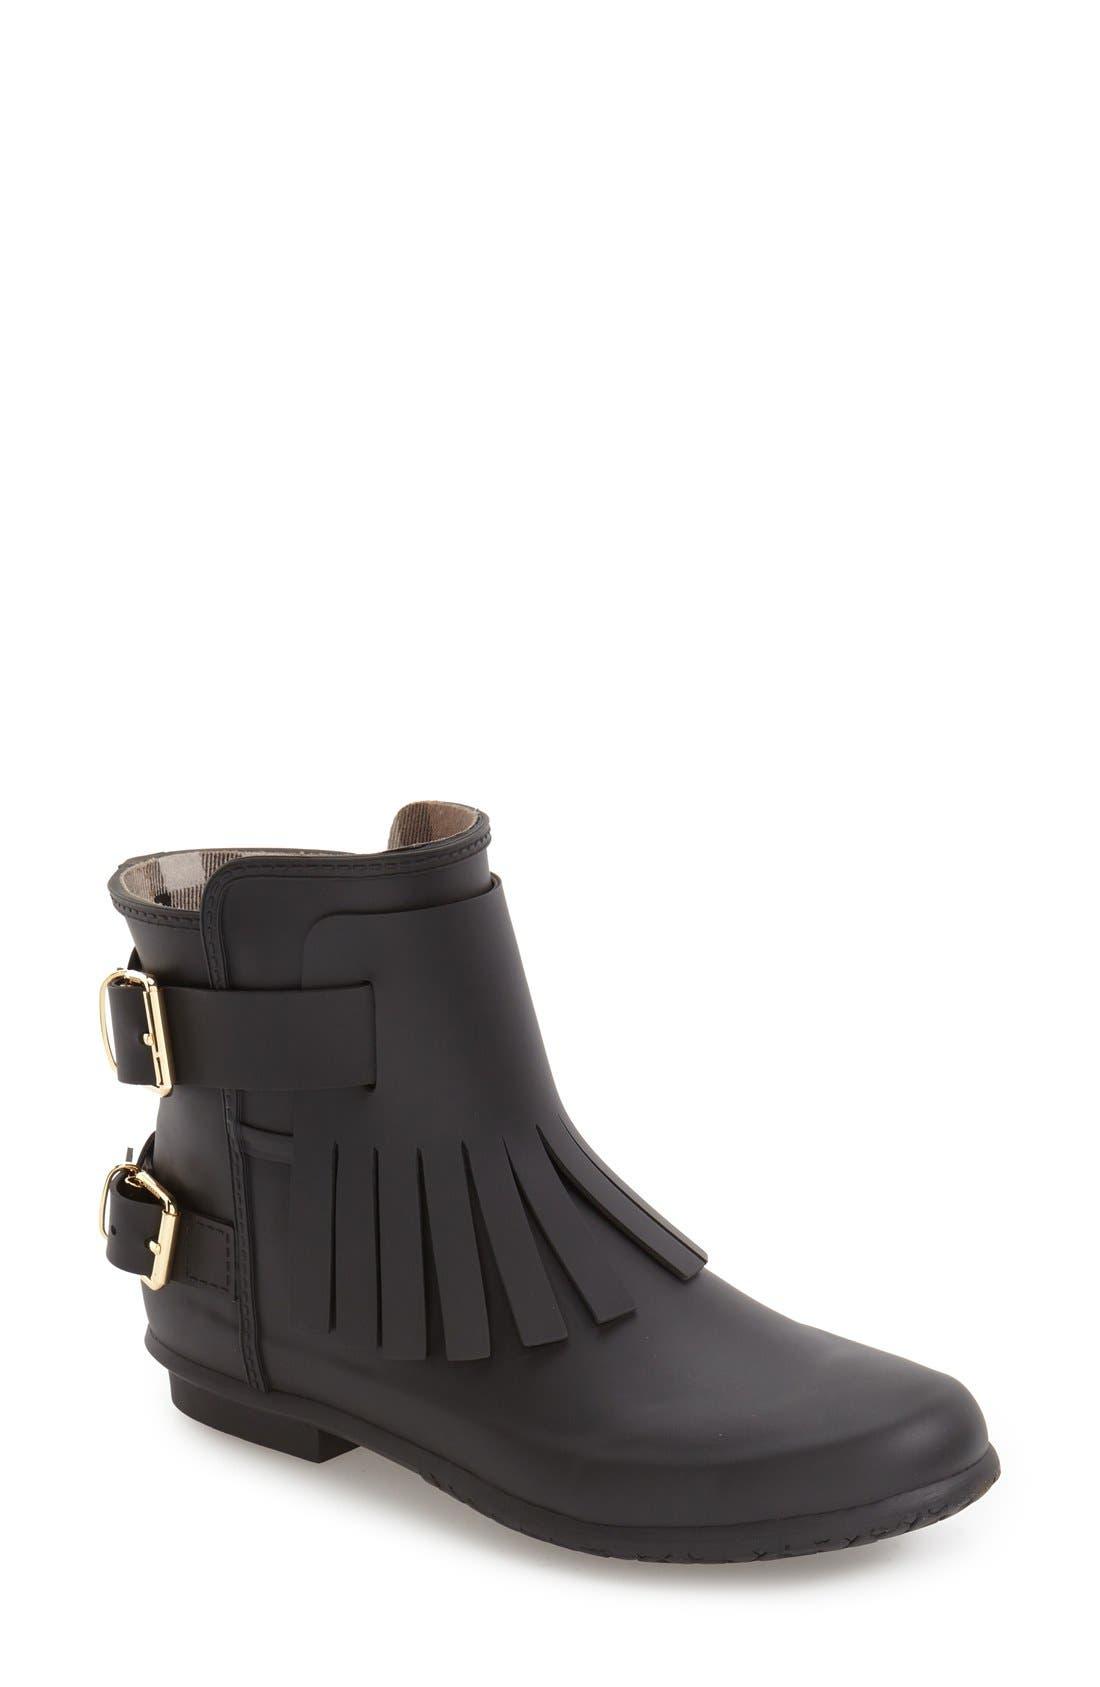 Main Image - Burberry 'Fritton' Kiltie Rain Boot (Women)